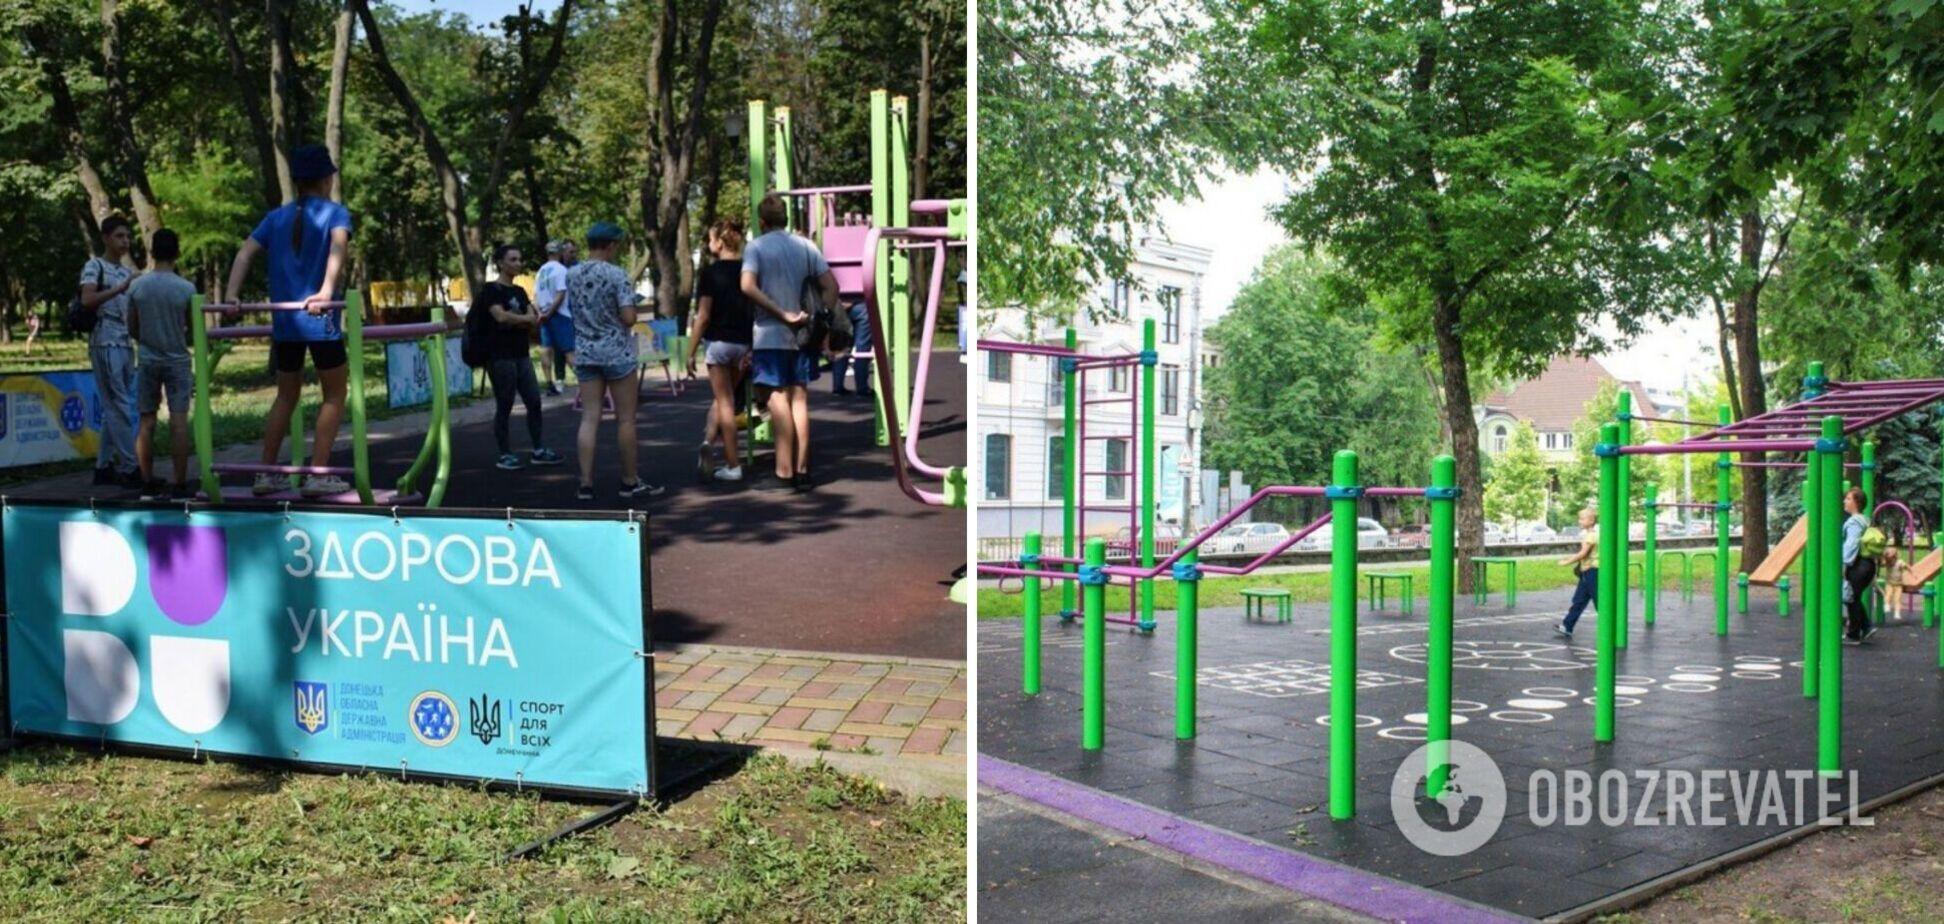 В Офисе президента пообещали спортплощадки 'в каждом дворе' и тренировки с Зеленским. Фото